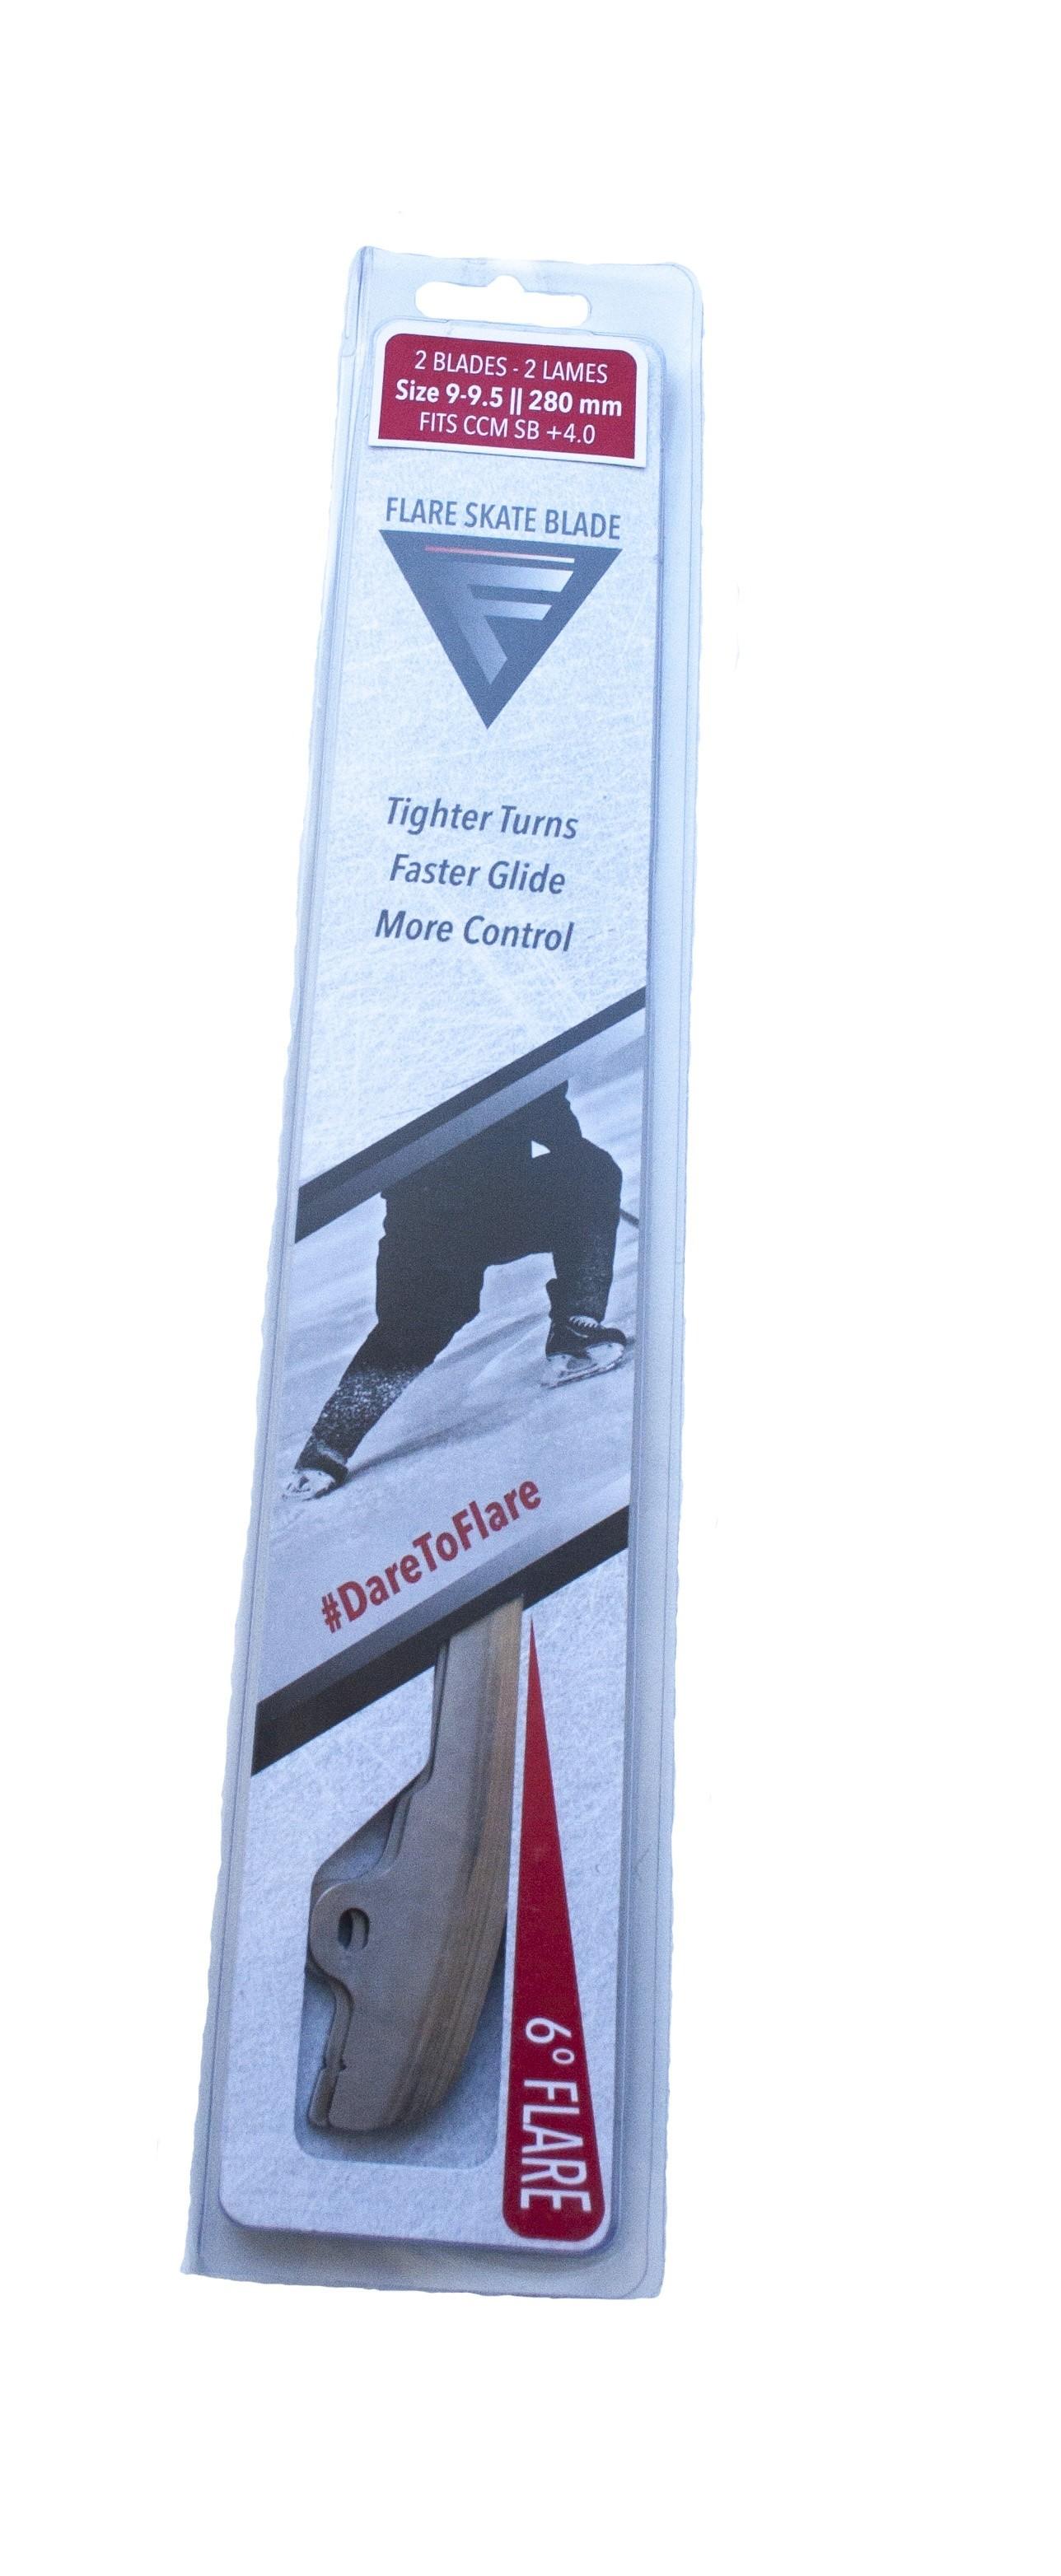 FLARE SKATE BLADE Speed Blade +4.0 Лезвия 6 Degree